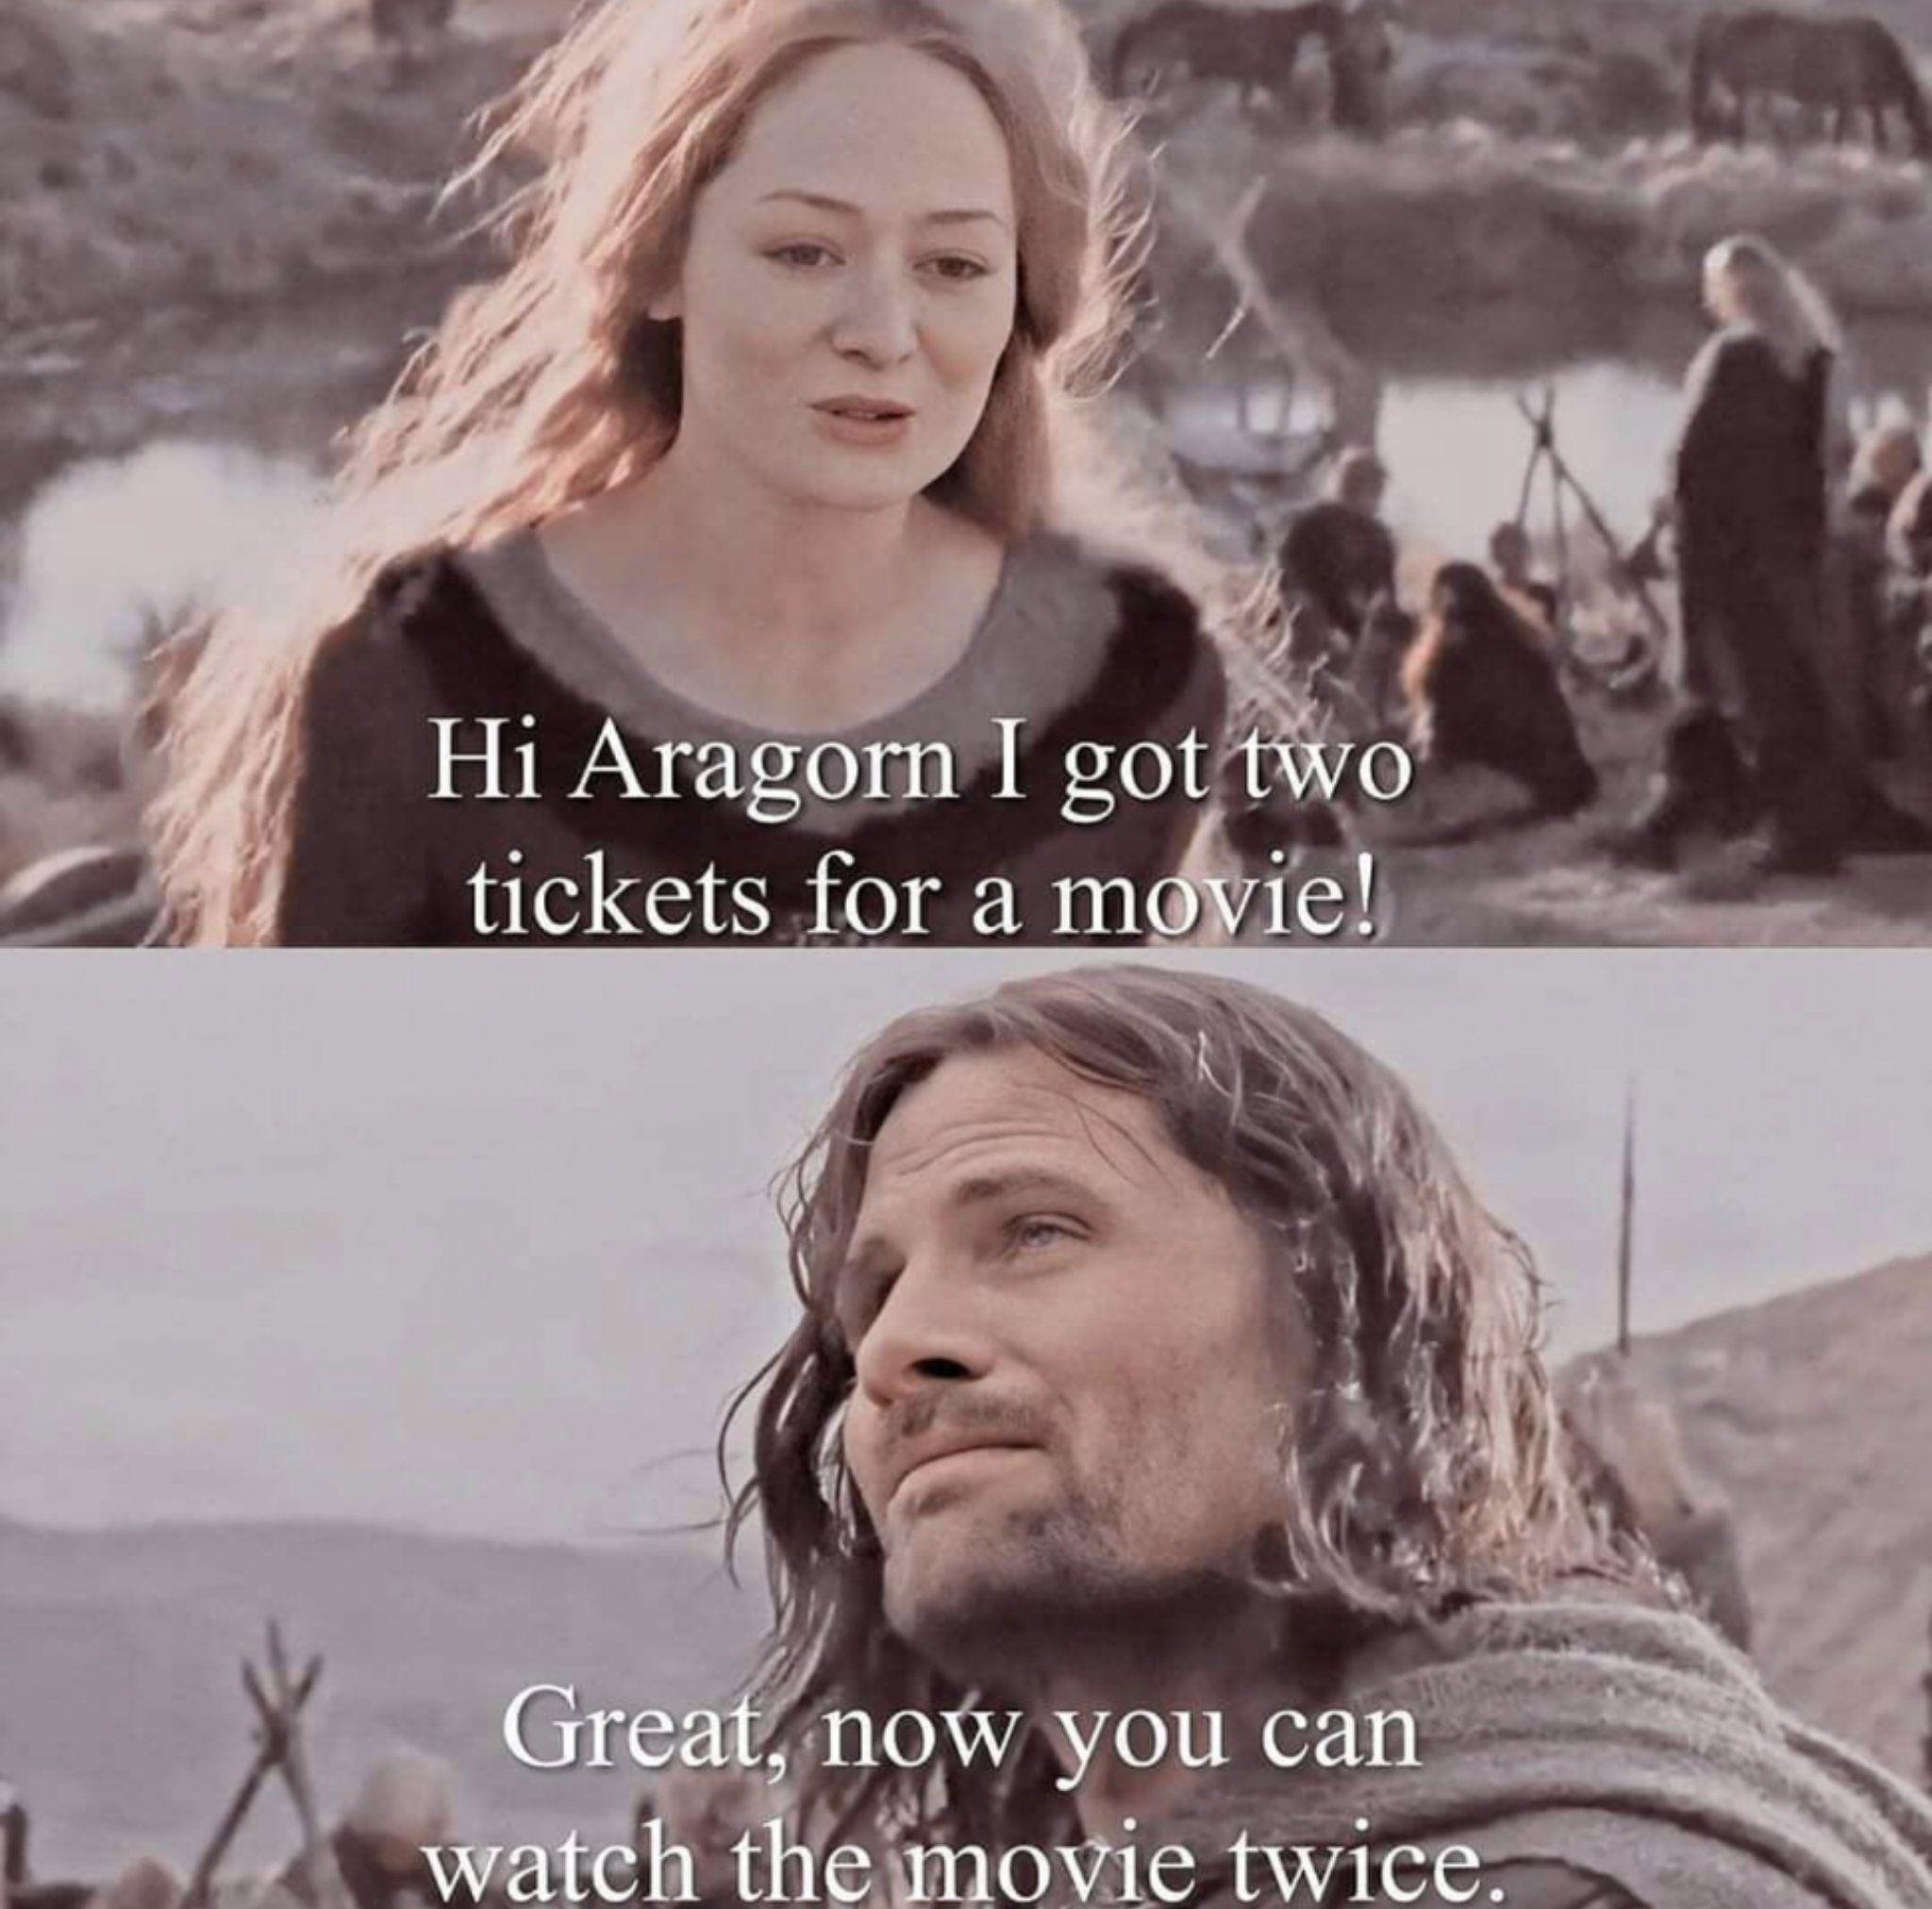 Well play Aragorn